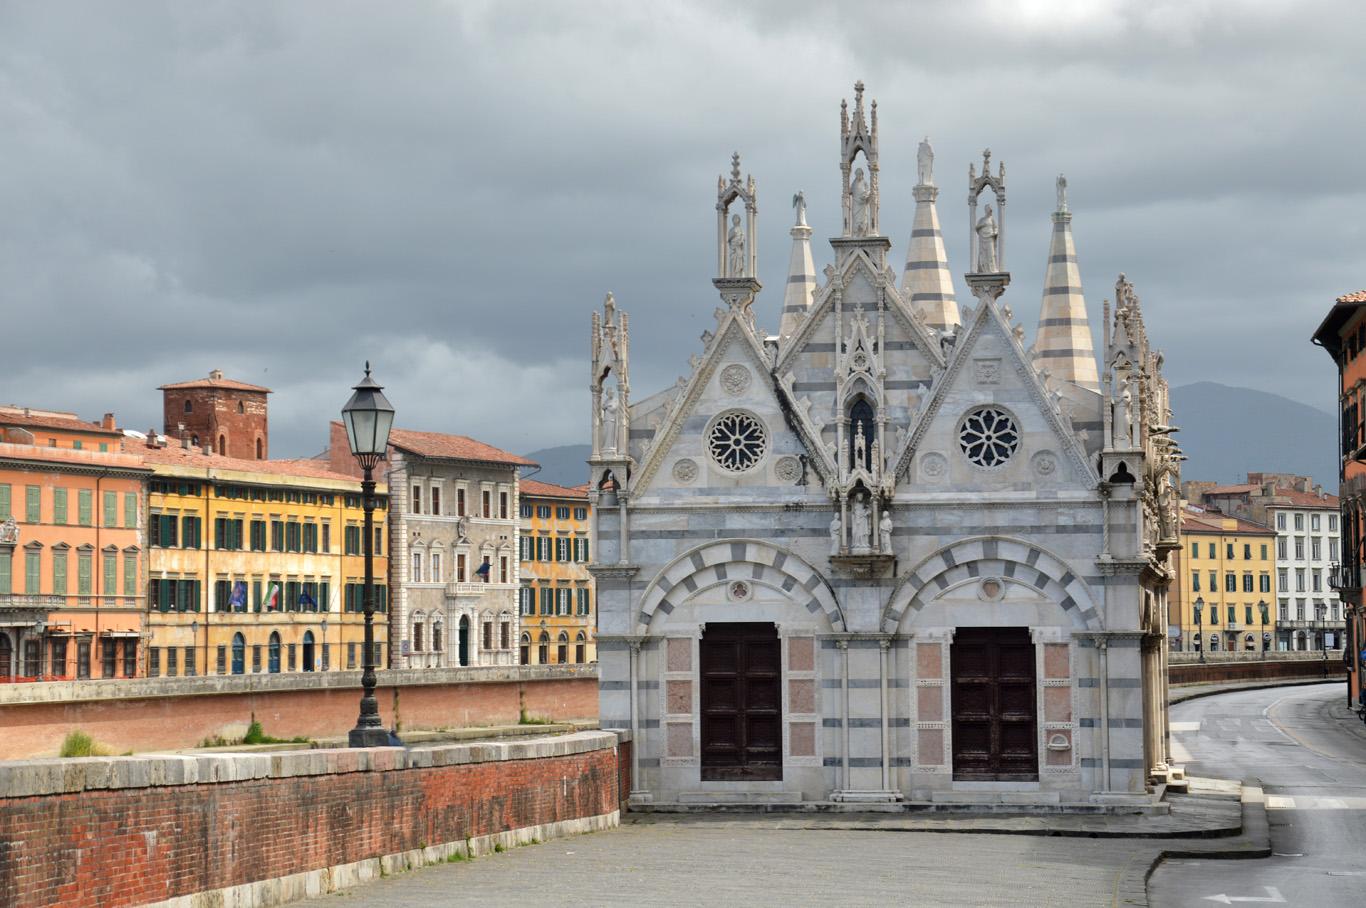 Santa Maria della Spina